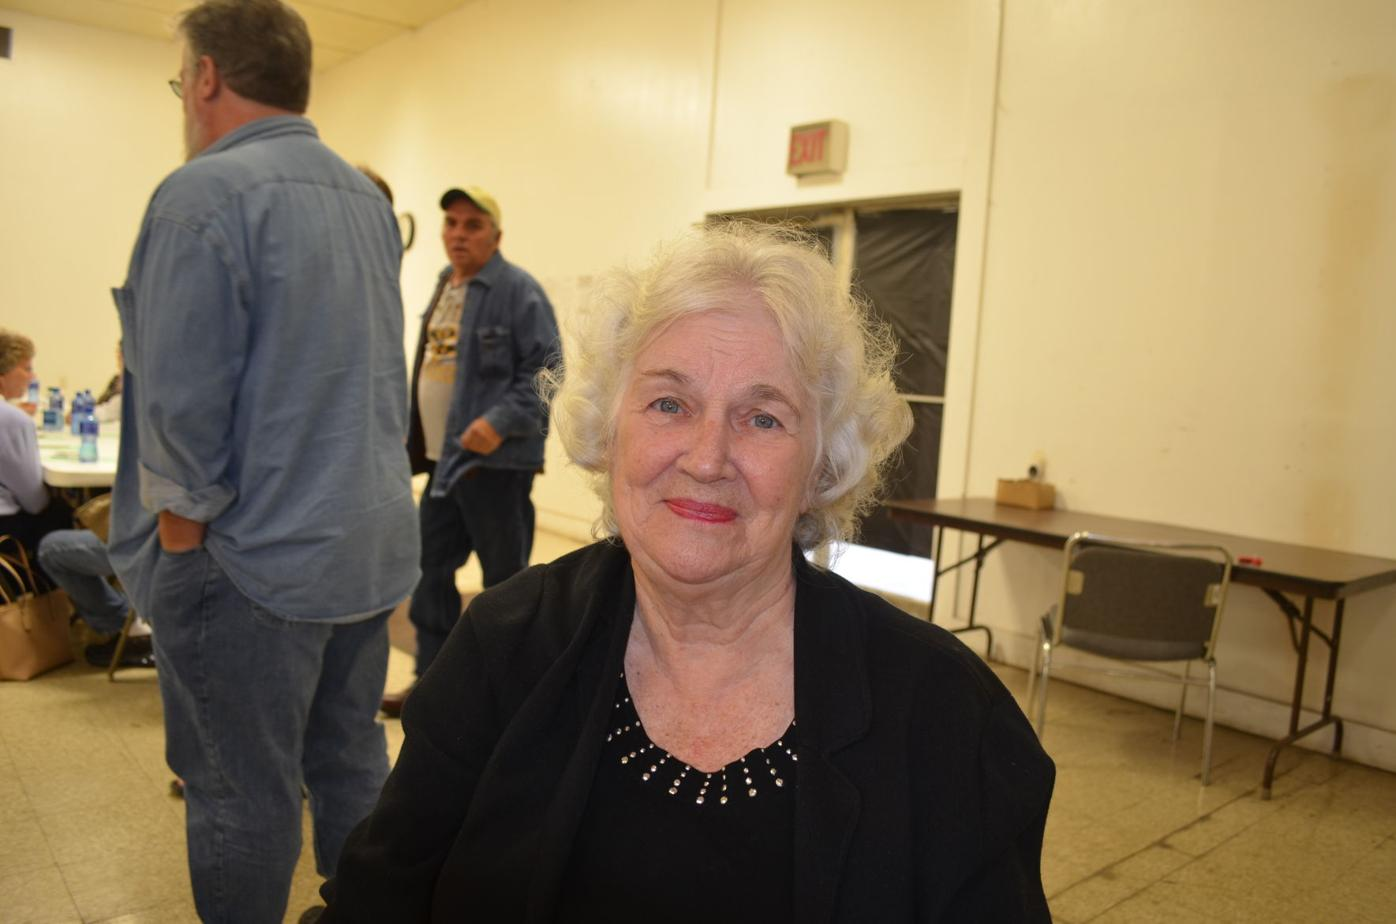 Janice Cosco